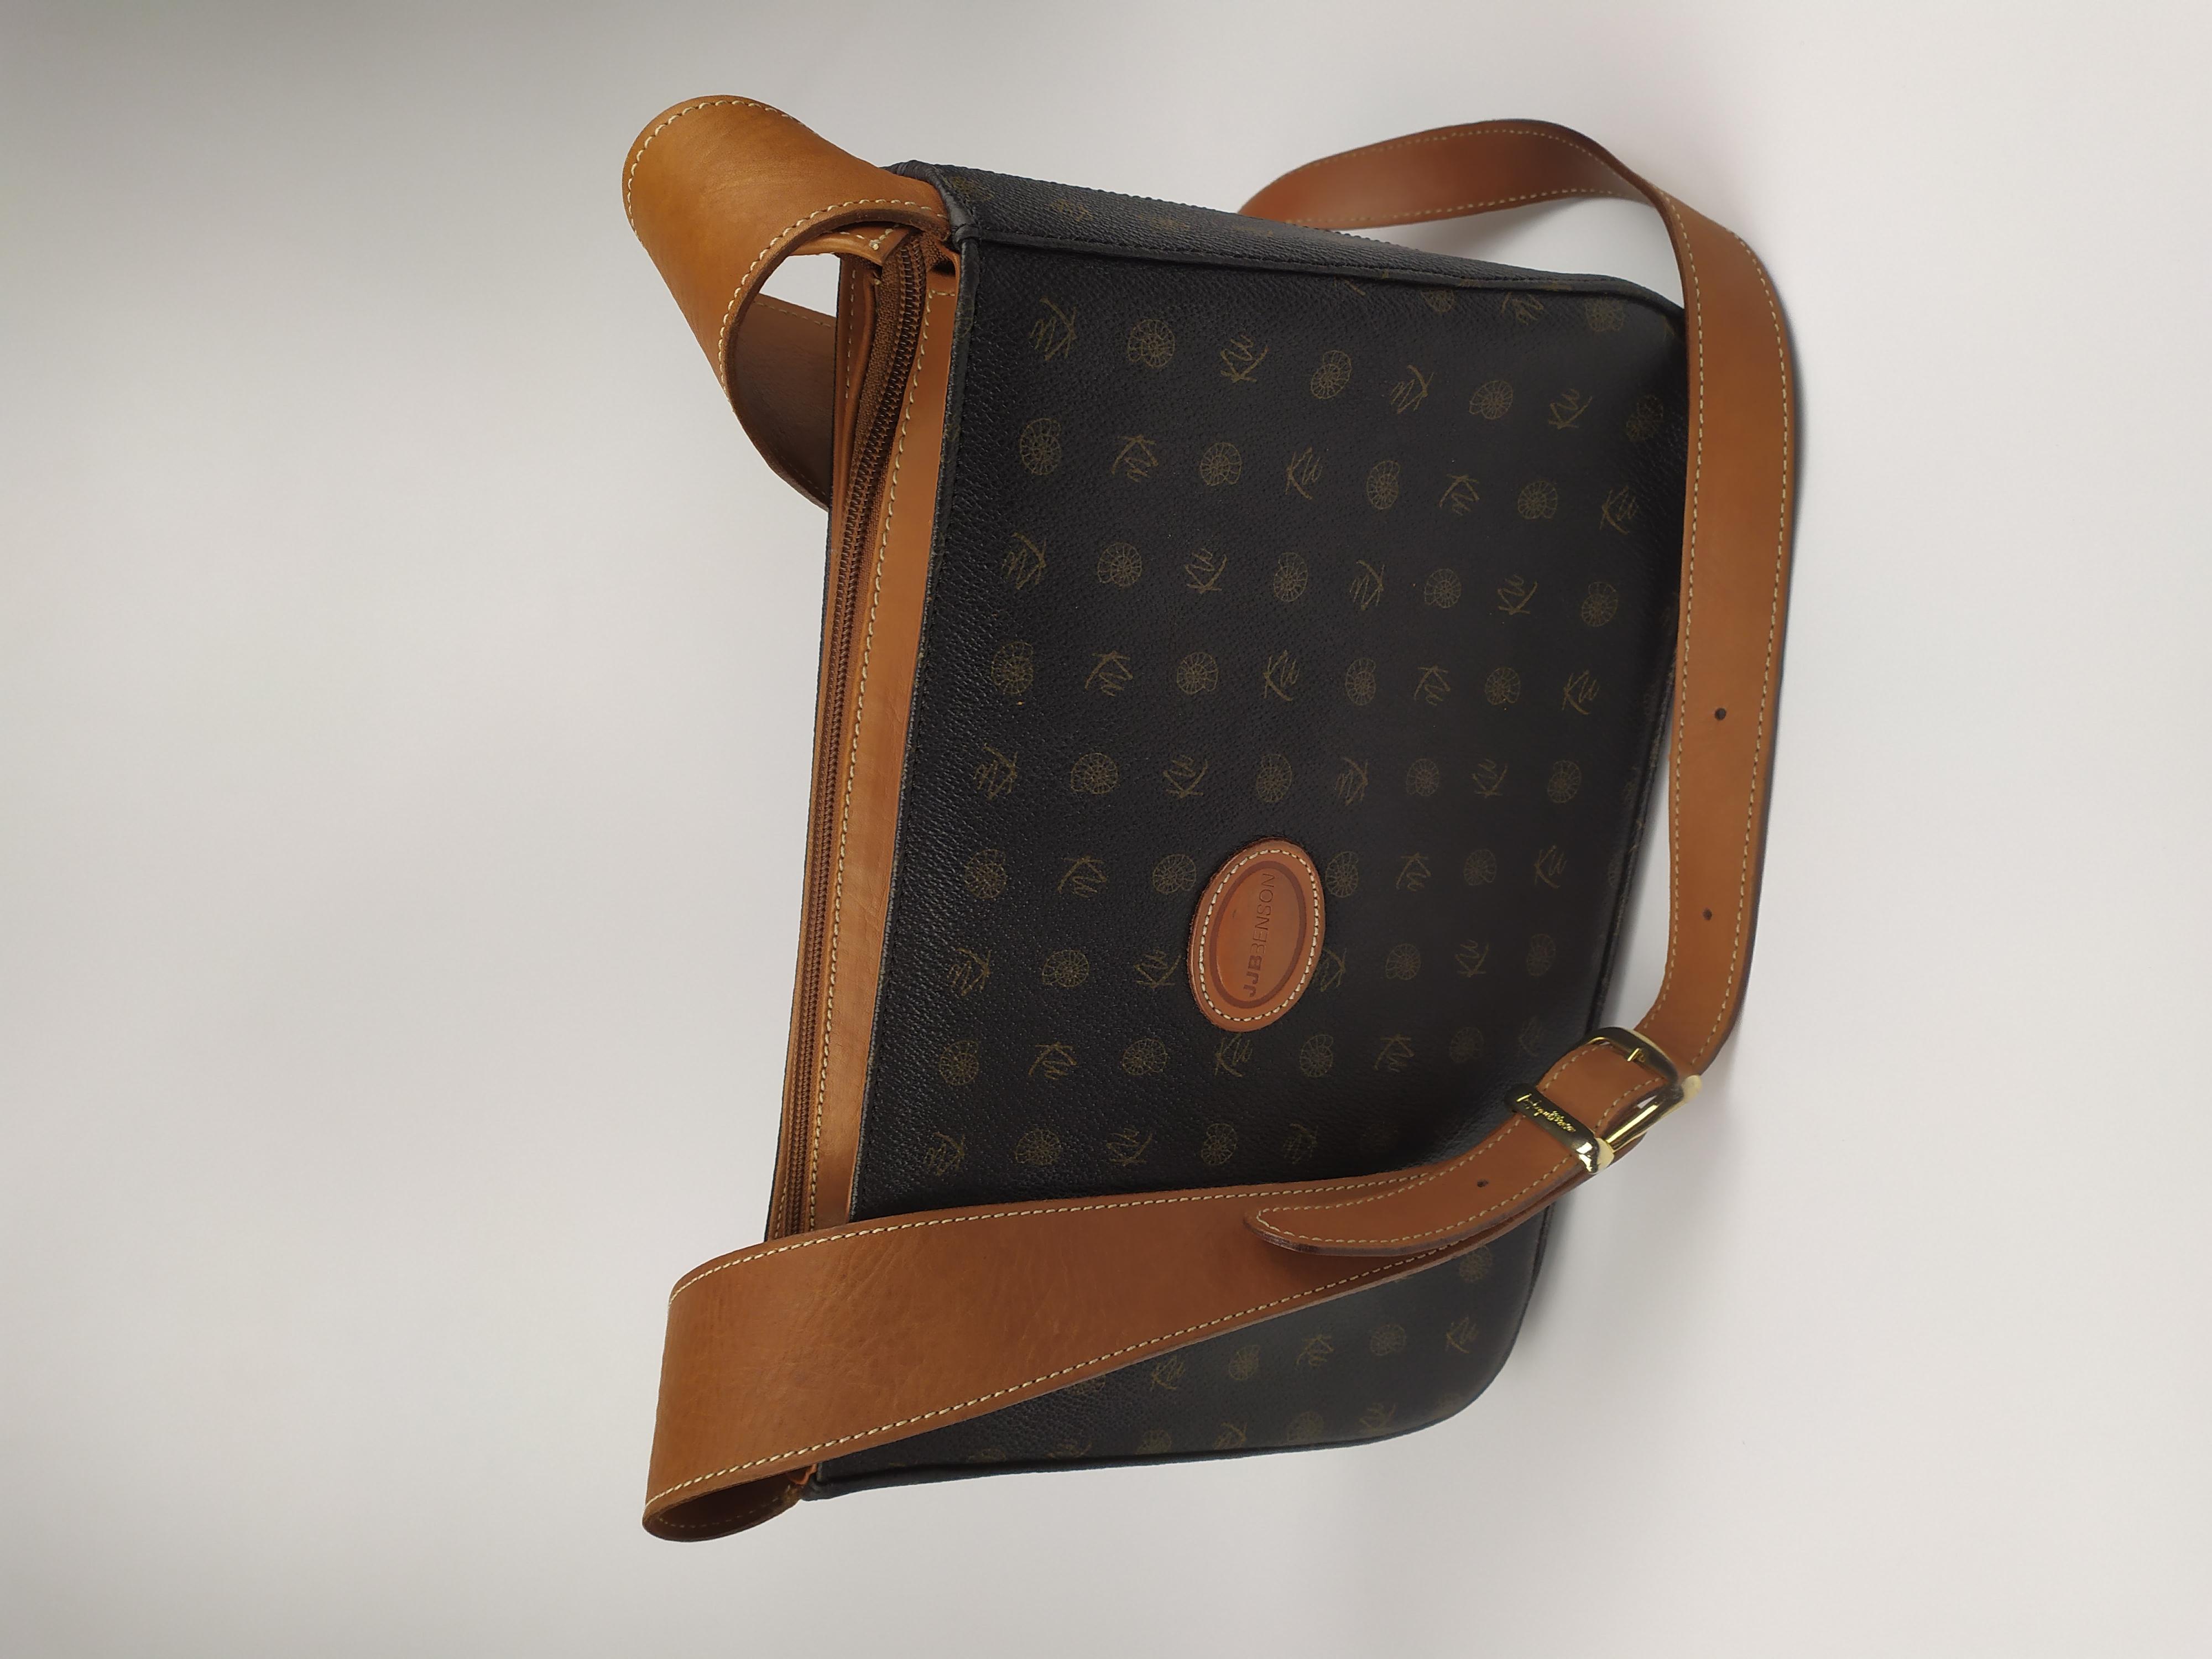 Фирменная сумка через плечо по типу louis vuitton фото №1